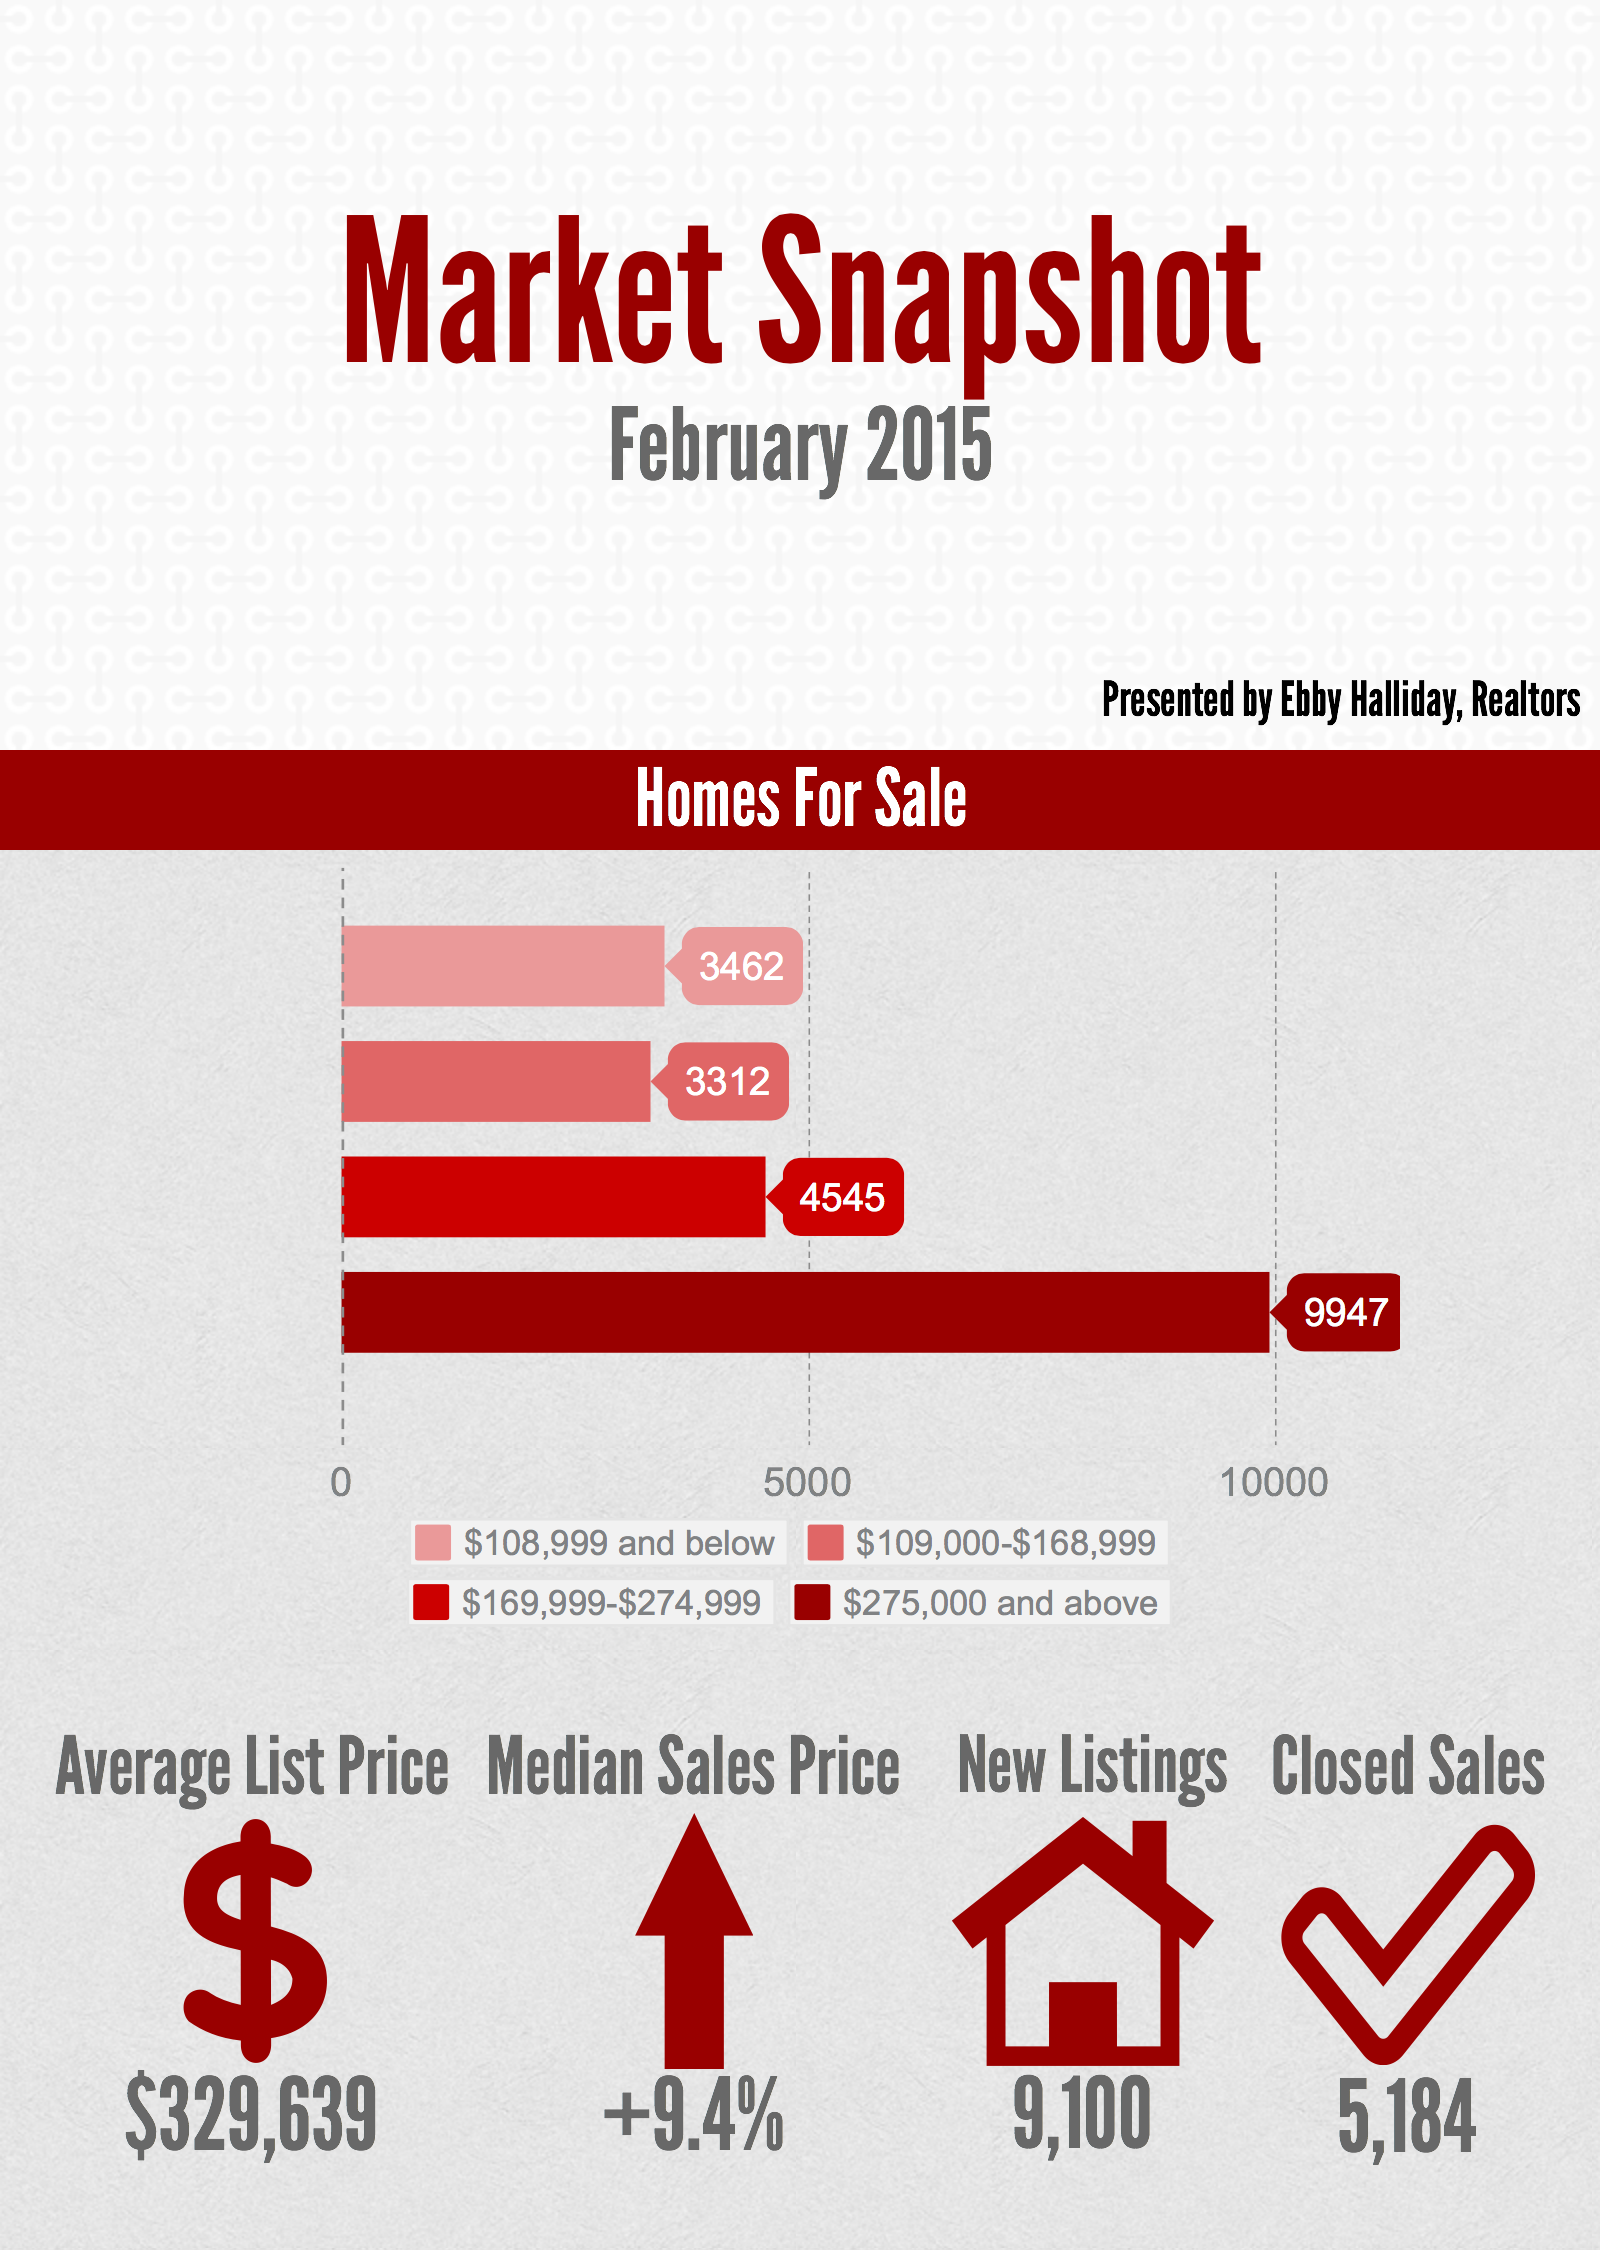 Market Snapshot: February 2015